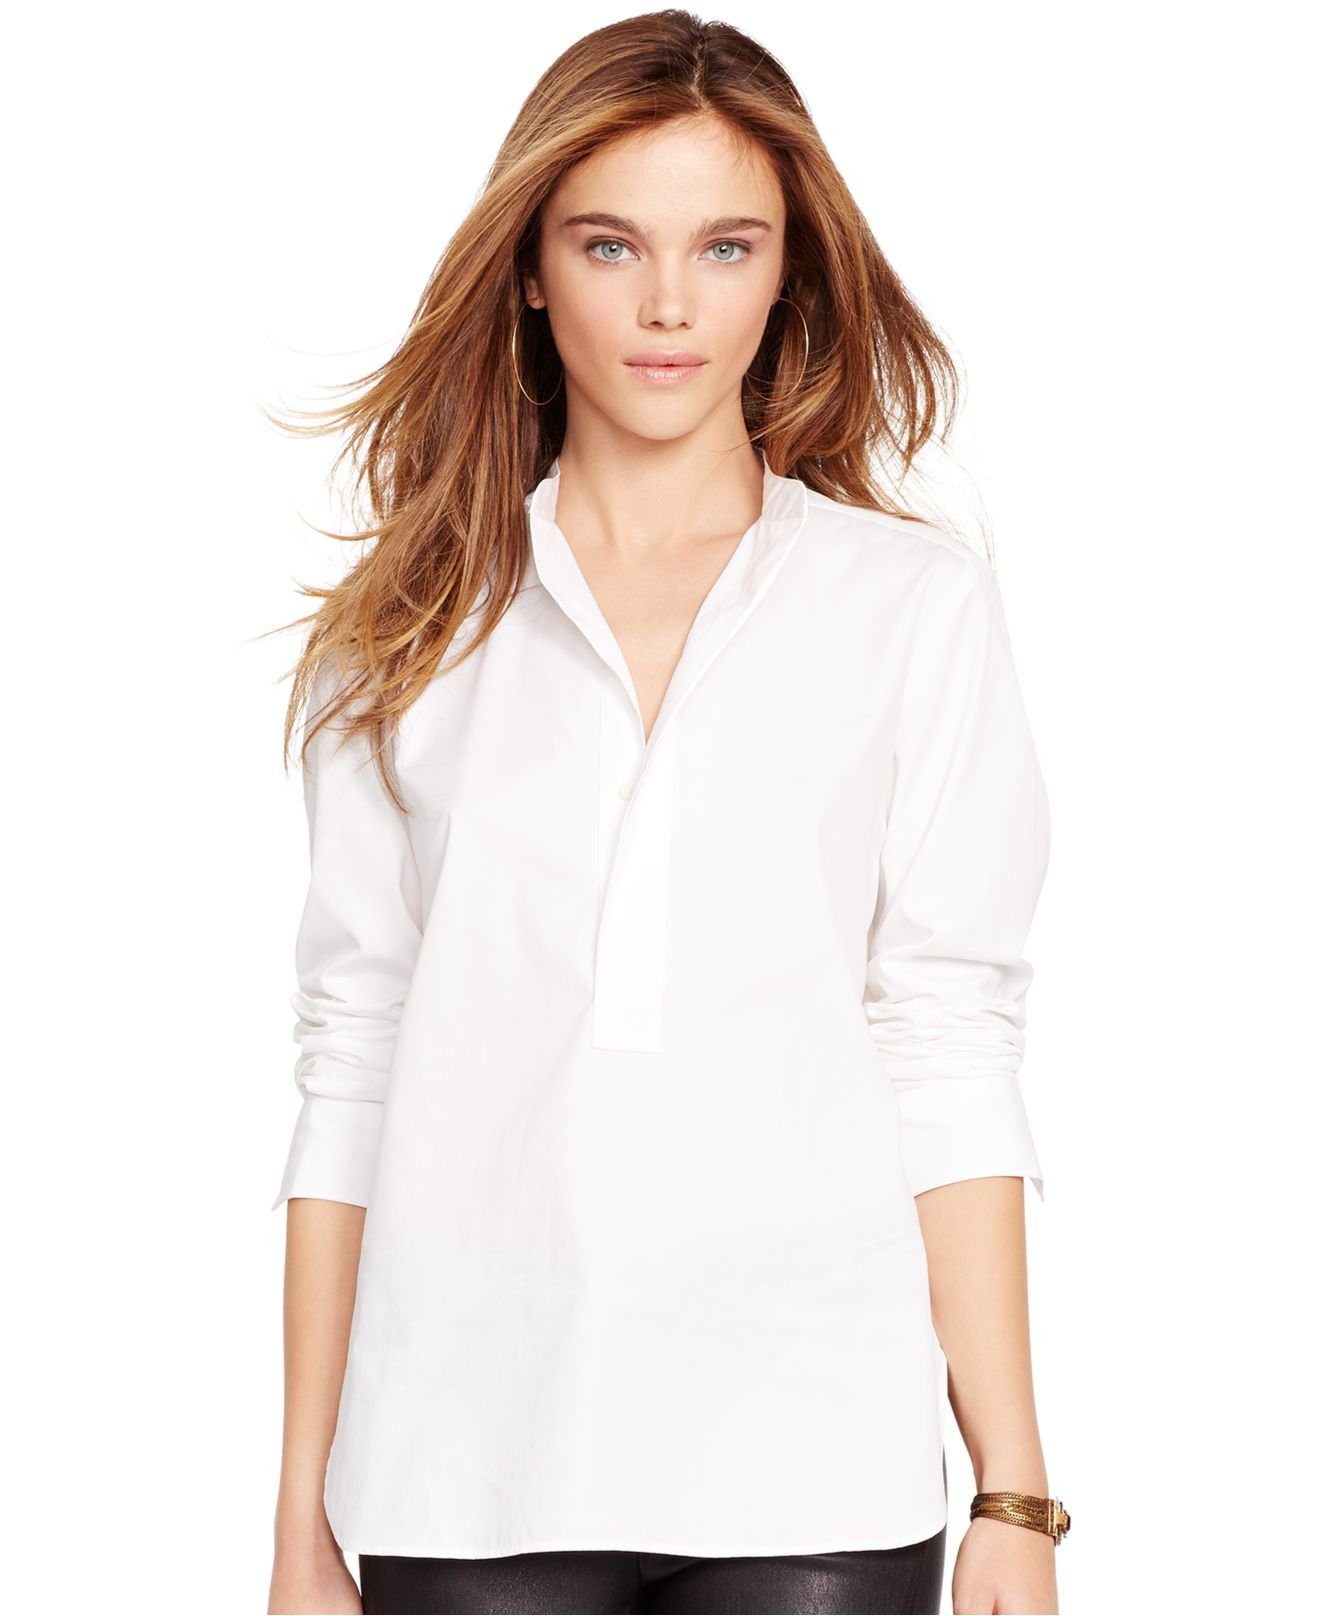 Lyst - Polo Ralph Lauren Long-sleeve Tunic in White 55e7054f61